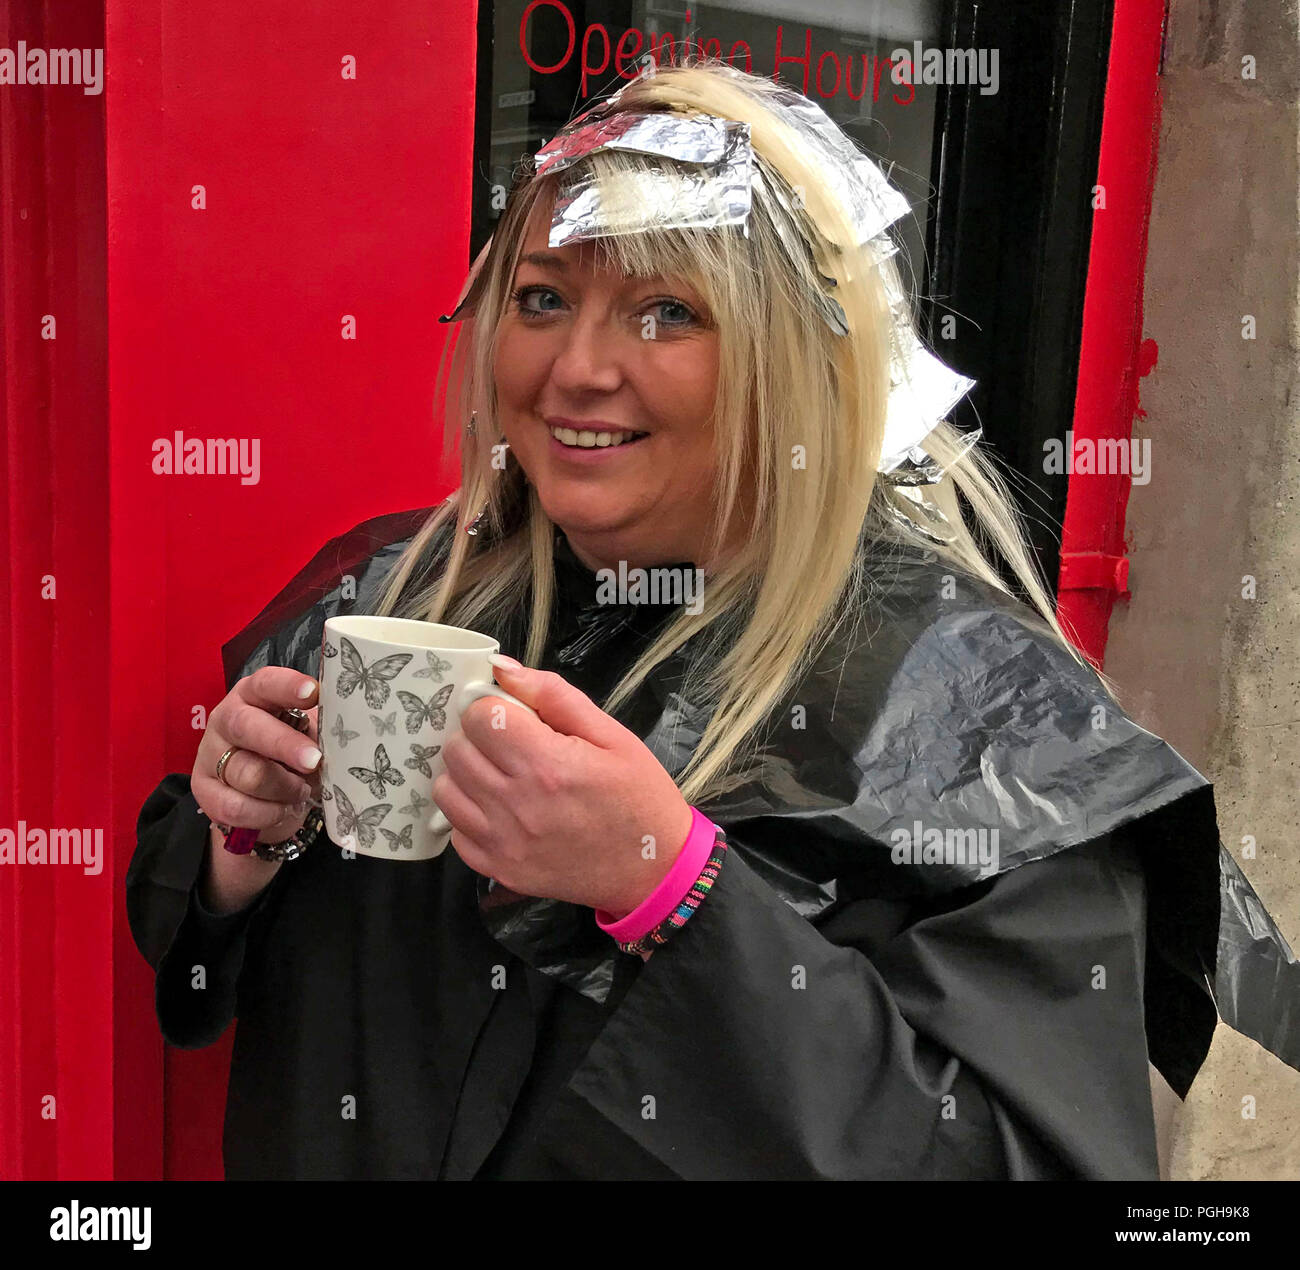 GoTonySmith,@HotpixUK,stylist,lady at beauty salon,woman at beauty salon,Lady at hair salon,woman at hairdressers,woman outside hairdressers,perm,colouring,colouring treatment,in hair,hair,Cooking,Perth,hair cooking,drinking tea,drinking coffee,mug,teacup,coffee cup,cape,Scotland,UK,beauty treatment,Female,colouring treatments,Smile,smiling,happy,blond,assisted,assisted blond,Assisted blonds,vanity,Roots,colouring roots,folicles,Colour treated hair